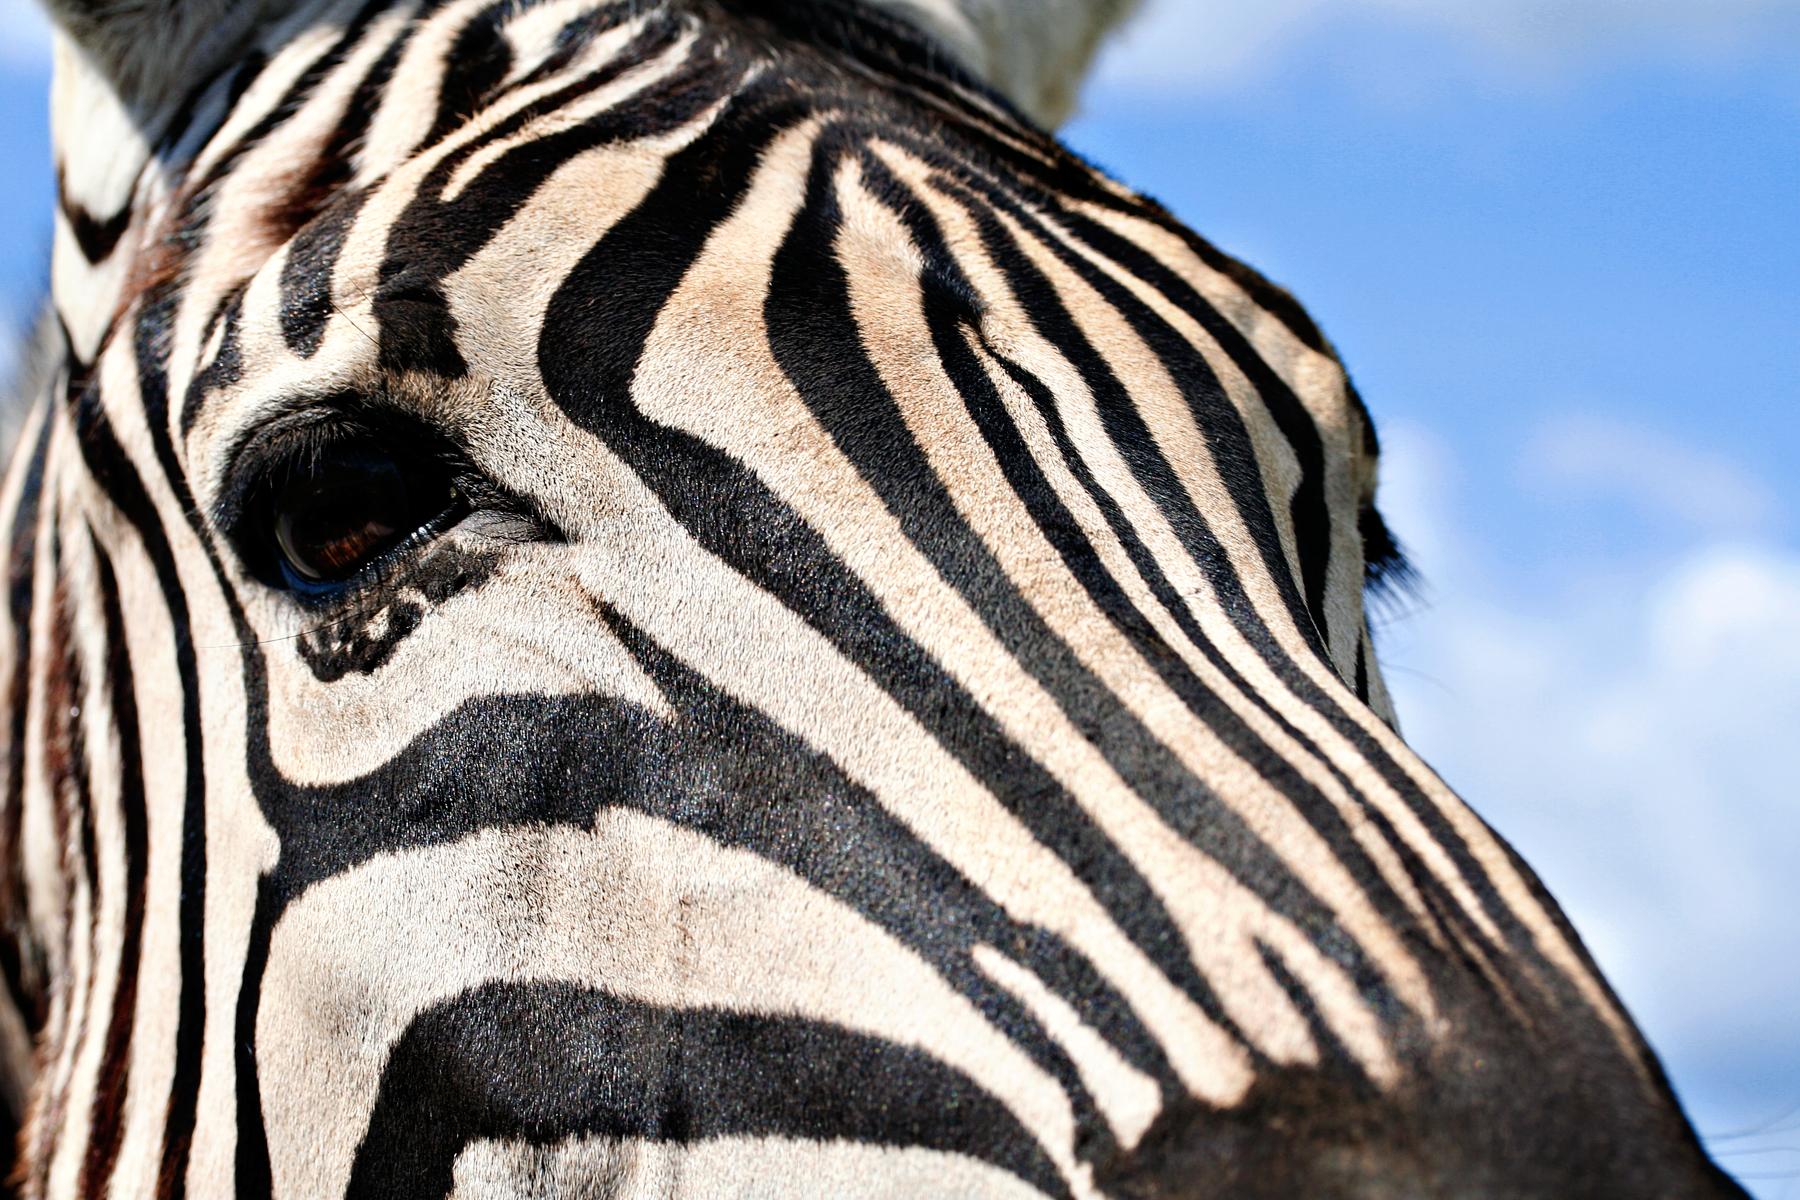 Zebra profile photo